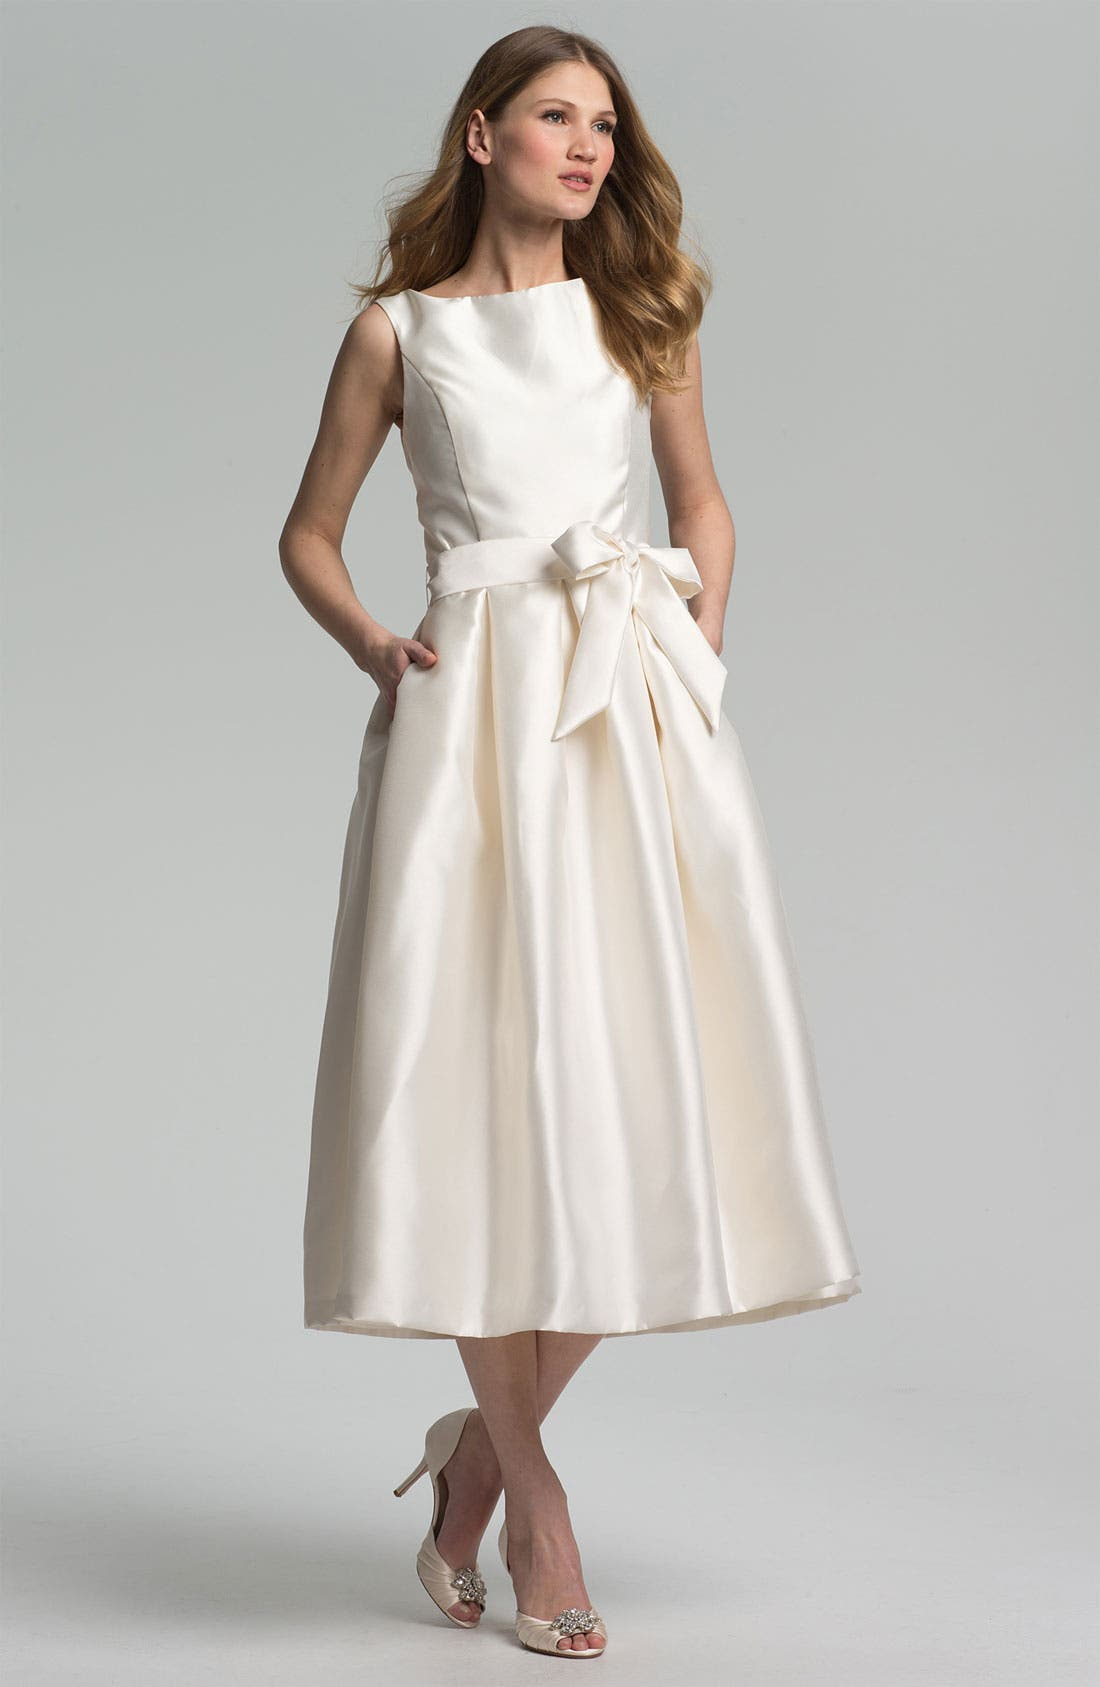 Faille Satin Fit & Flare Dress,                             Main thumbnail 1, color,                             900